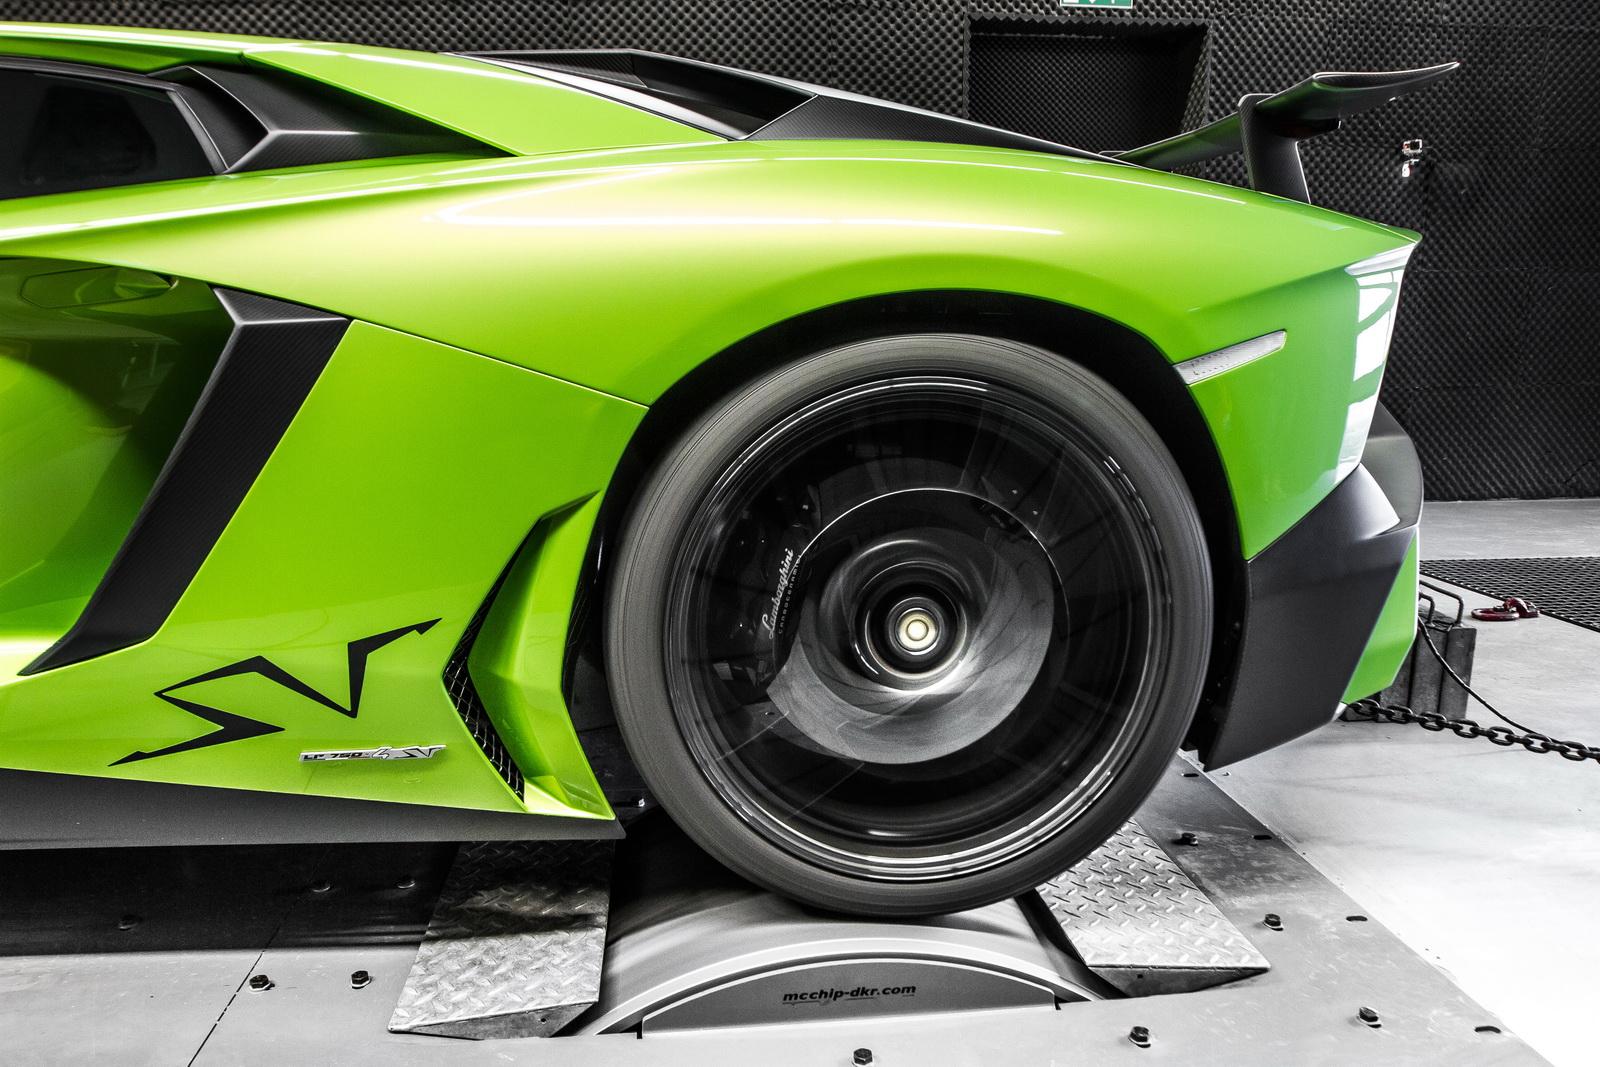 Lamborghini_Aventador_SV_by_Mcchip-DKR_03